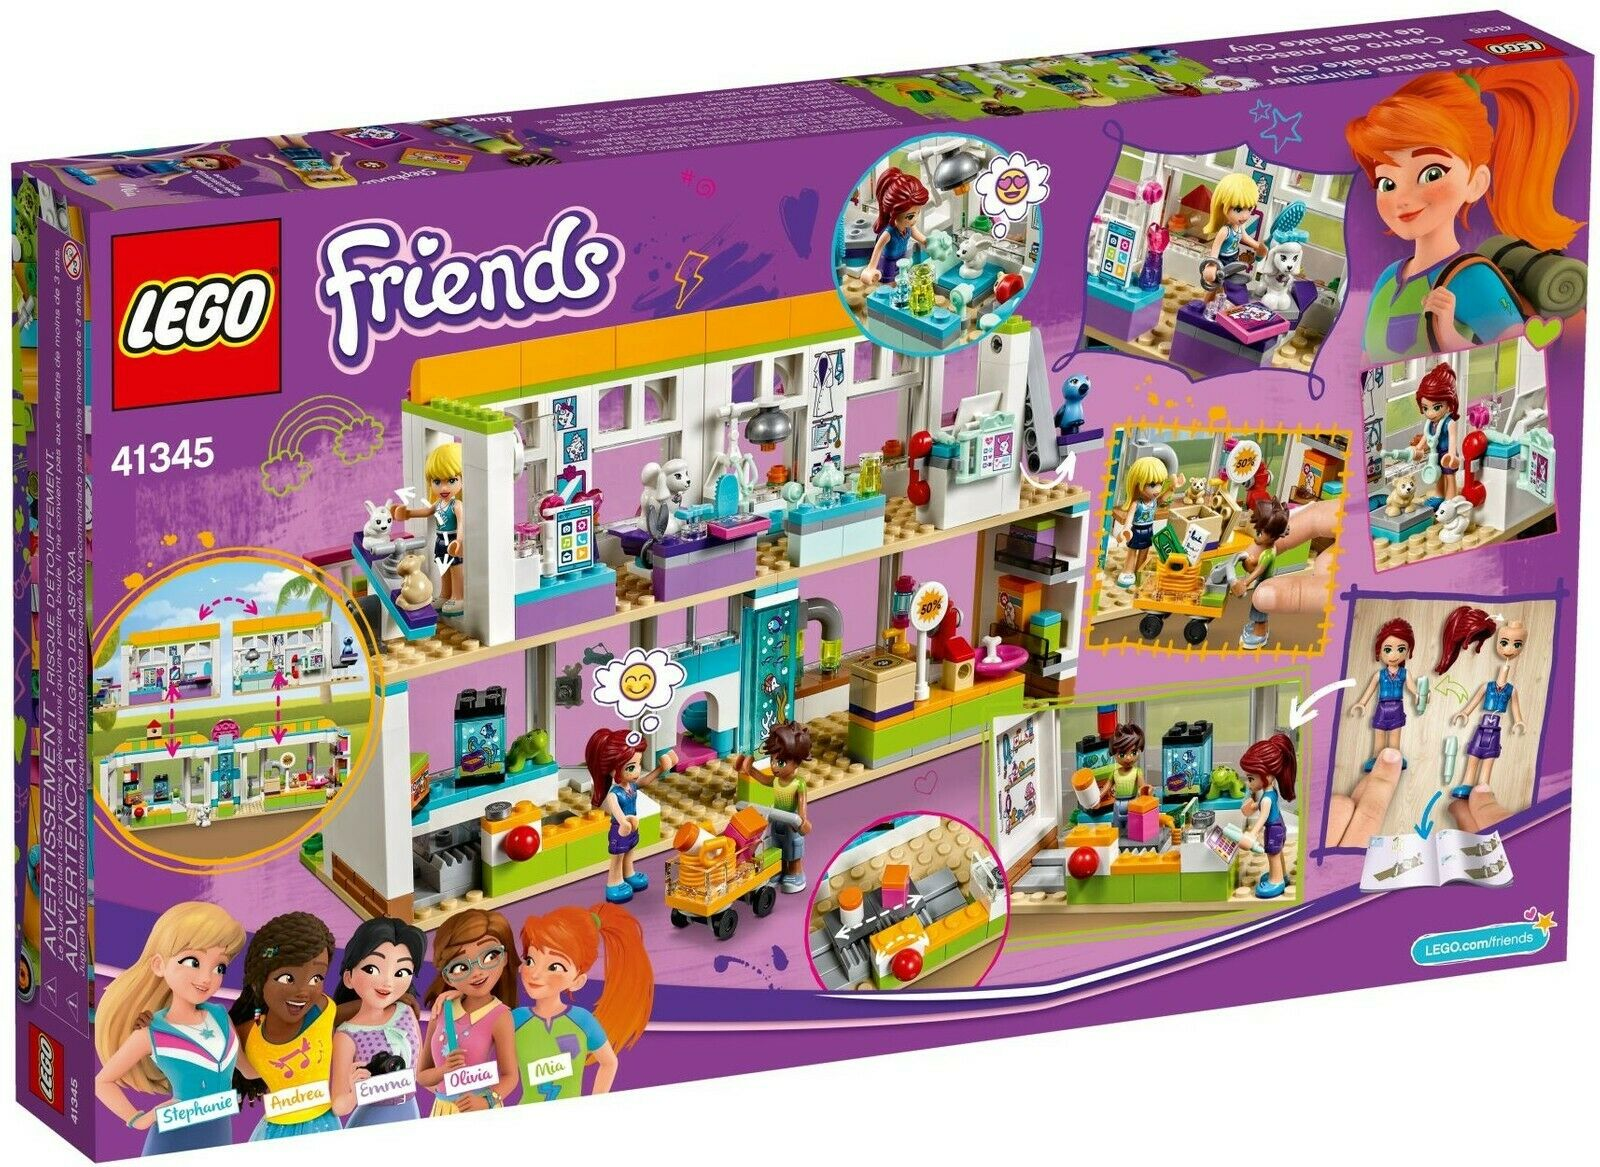 LEGO® Friends Friends Friends 41345 Heartlake City Haustierzentrum NEU OVP_ NEW MISB NRFB 516538